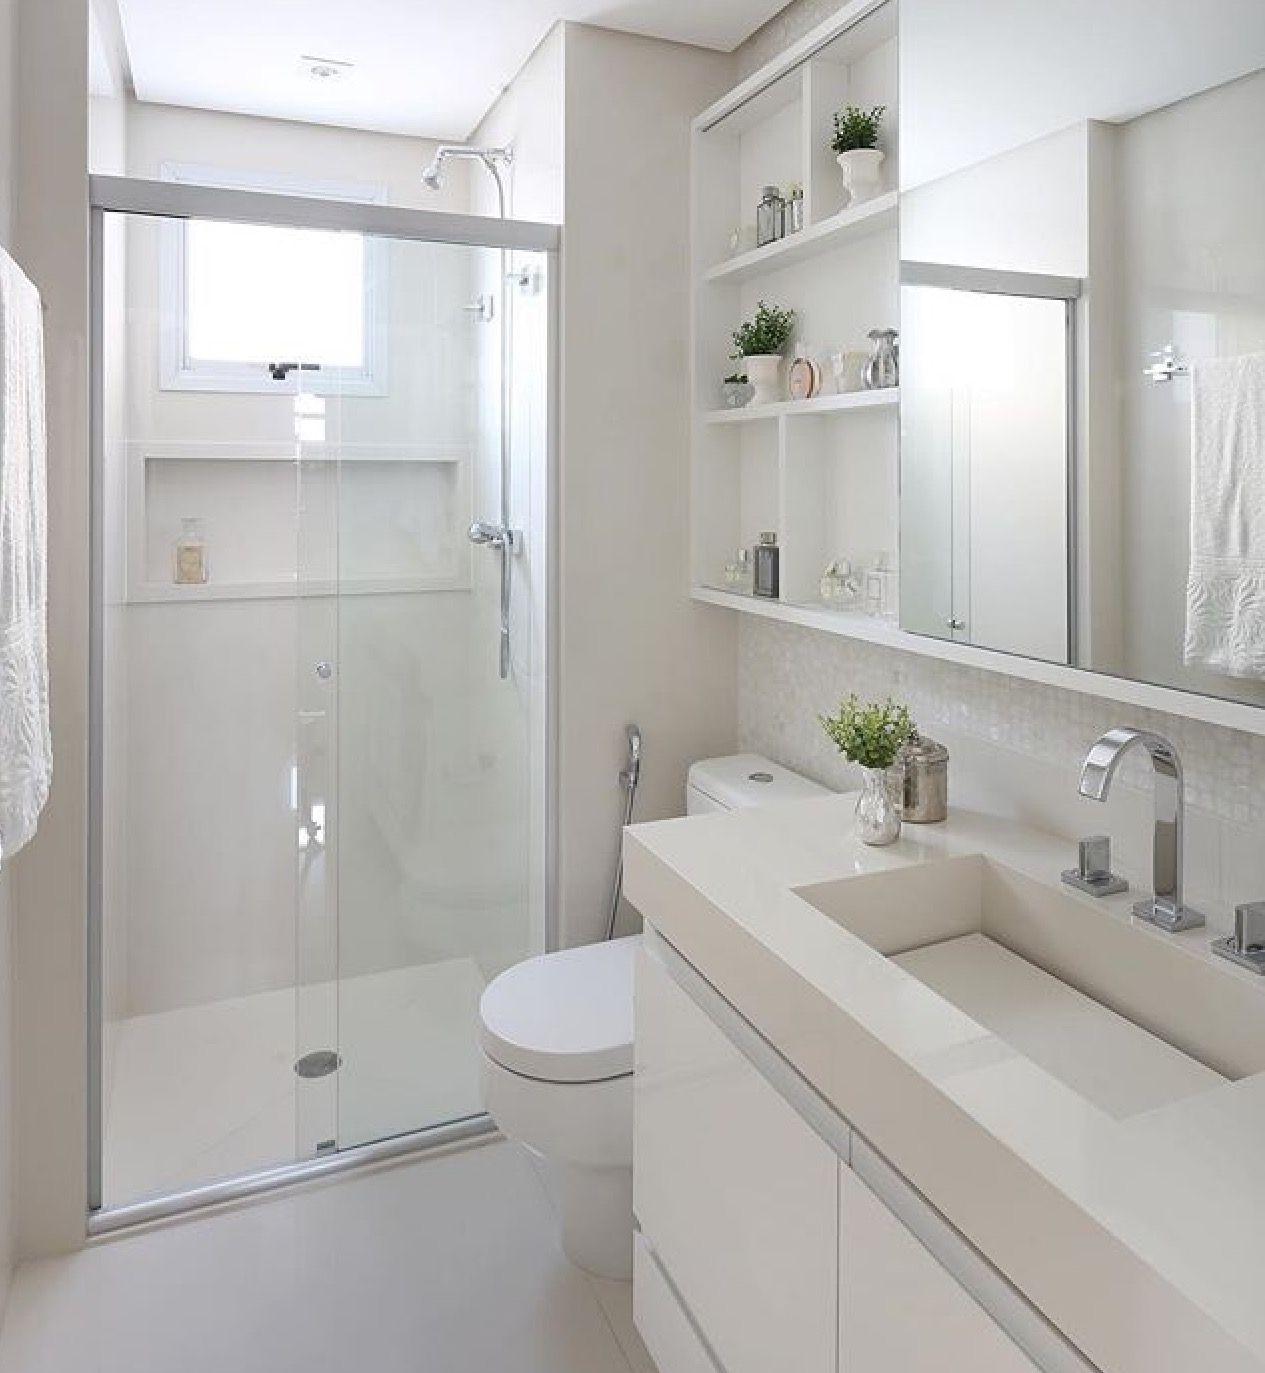 21 Amazing Narrow Bathroom Ideas | Decor Home Ideas